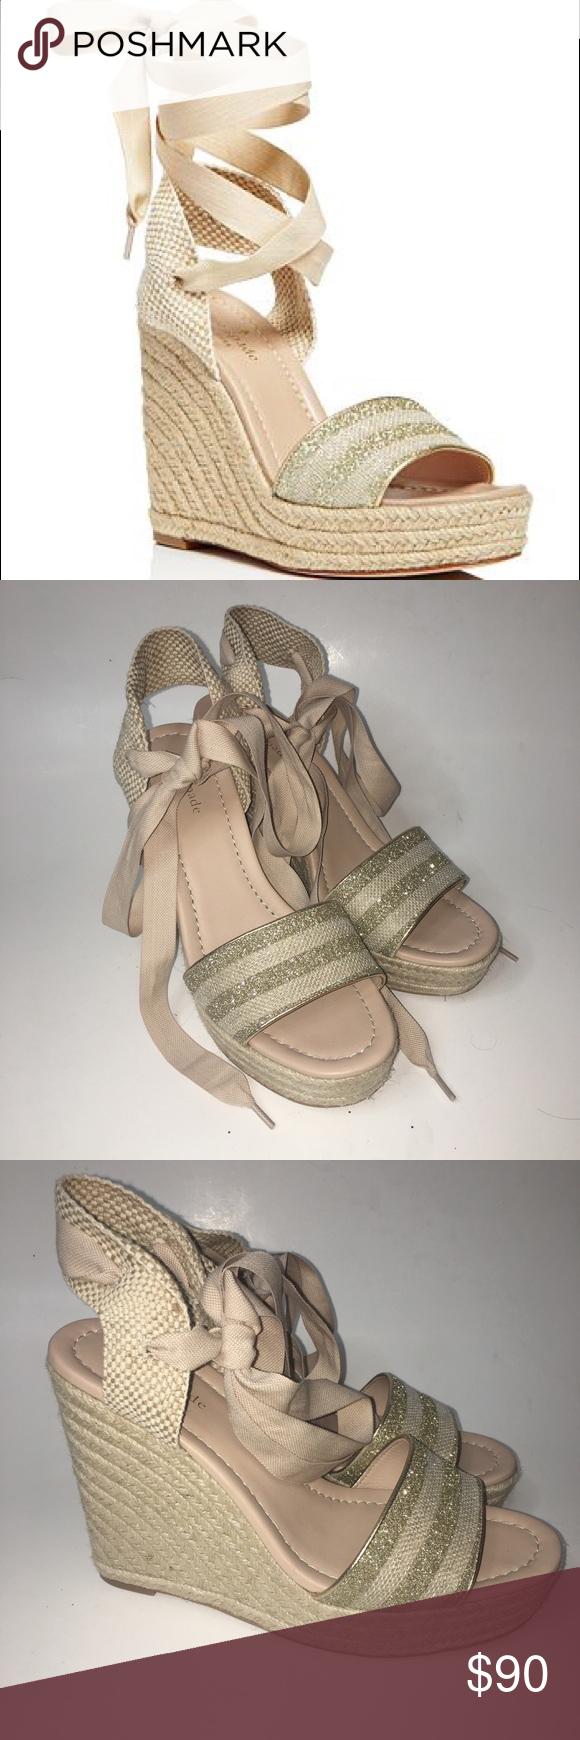 e152175567ee Kate Spade Delano Glitter Stripe Espadrille Wedges Like new Kate Spade  Delano Glitter Stripe Lace Up Espadrille Platform Wedge Sandals In size 9. kate  spade ...